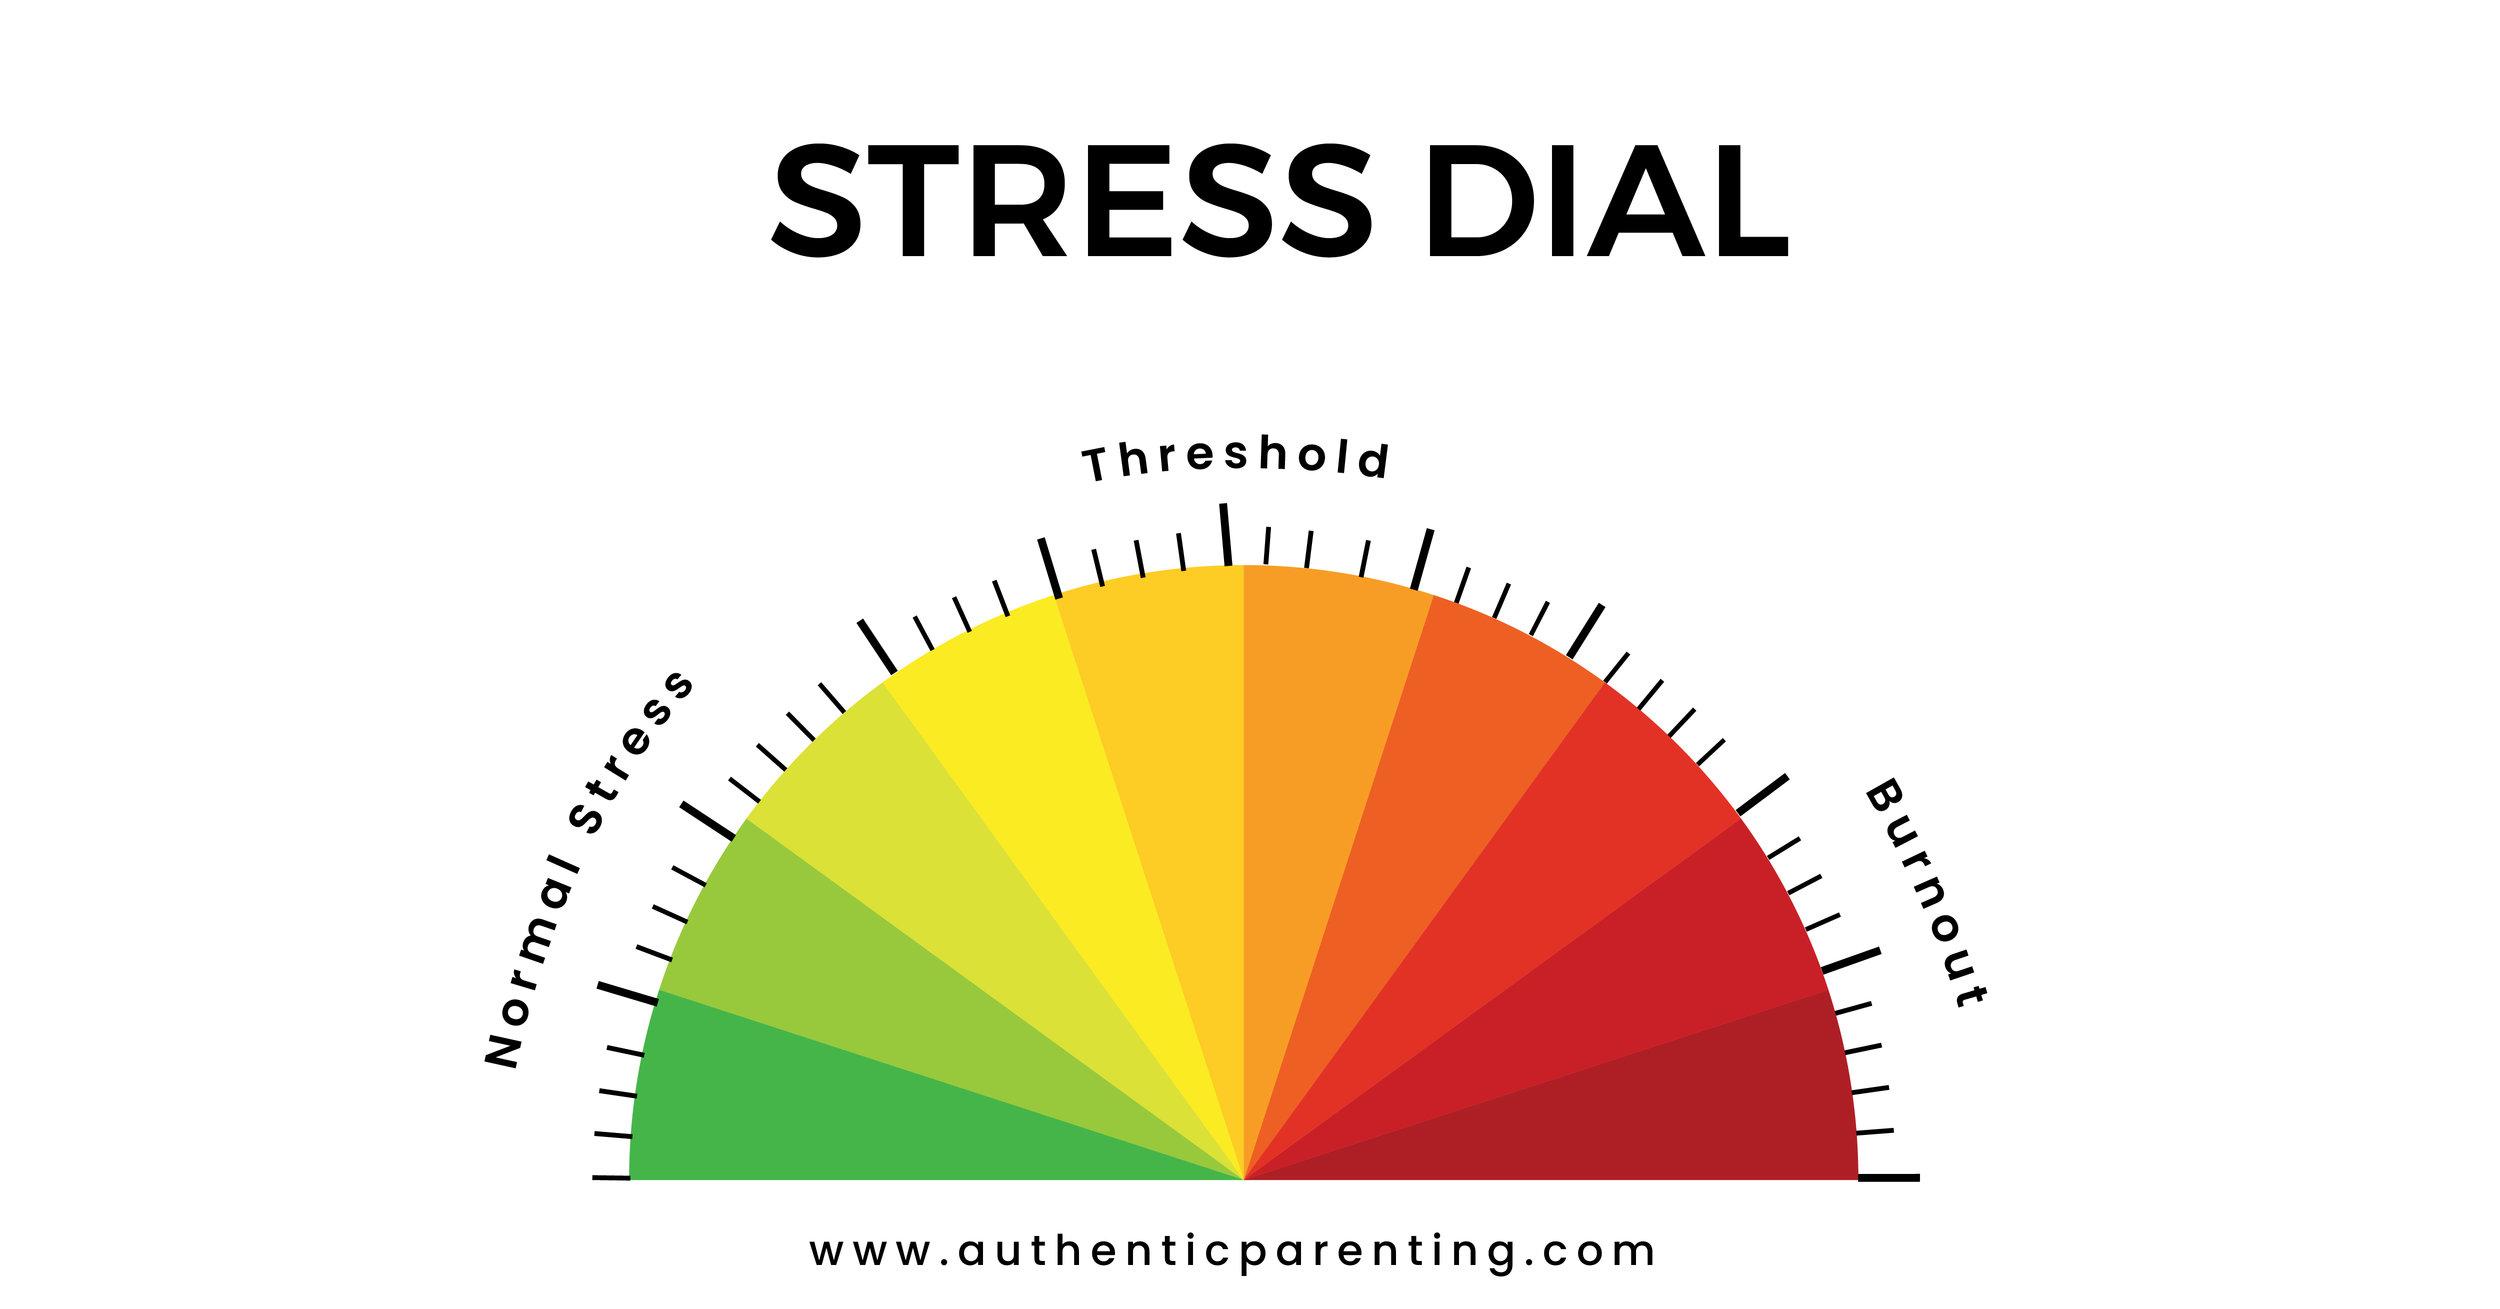 Anna Seewald Stress Dial